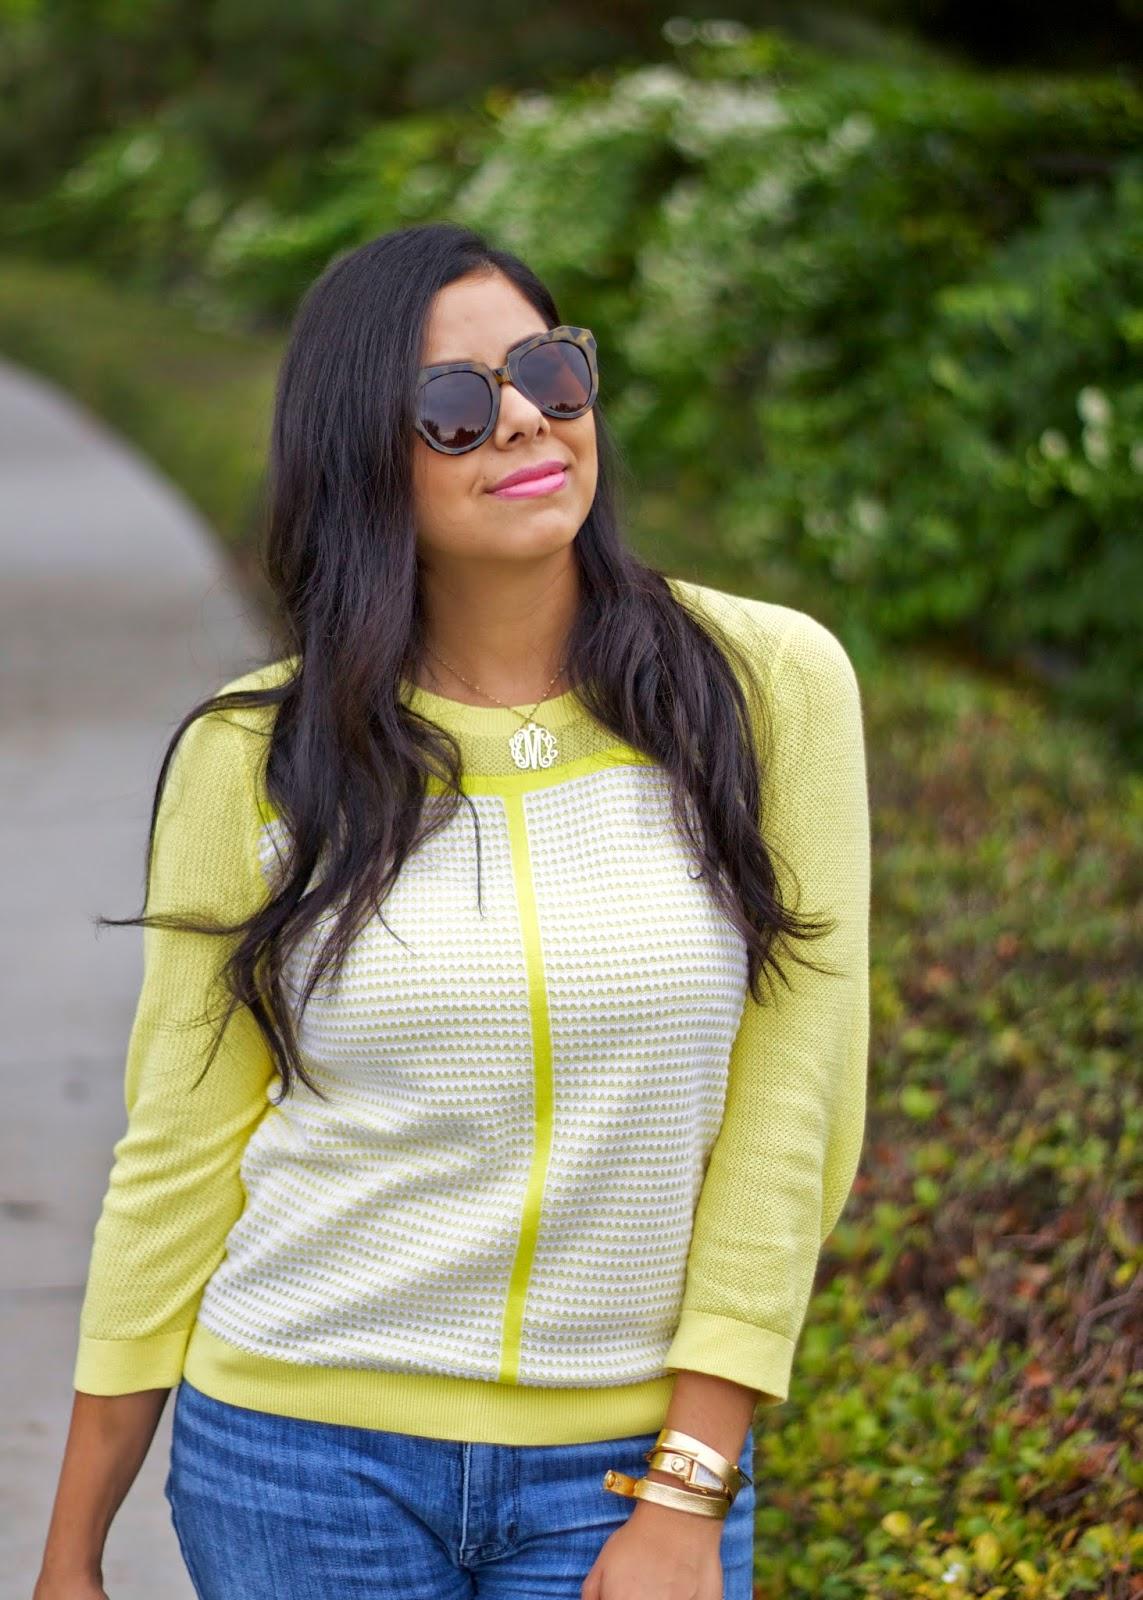 Karen Walker SUnnies blogger, blogger of affordable fashion, best affordable fashion blogger, sunglass trends 2014